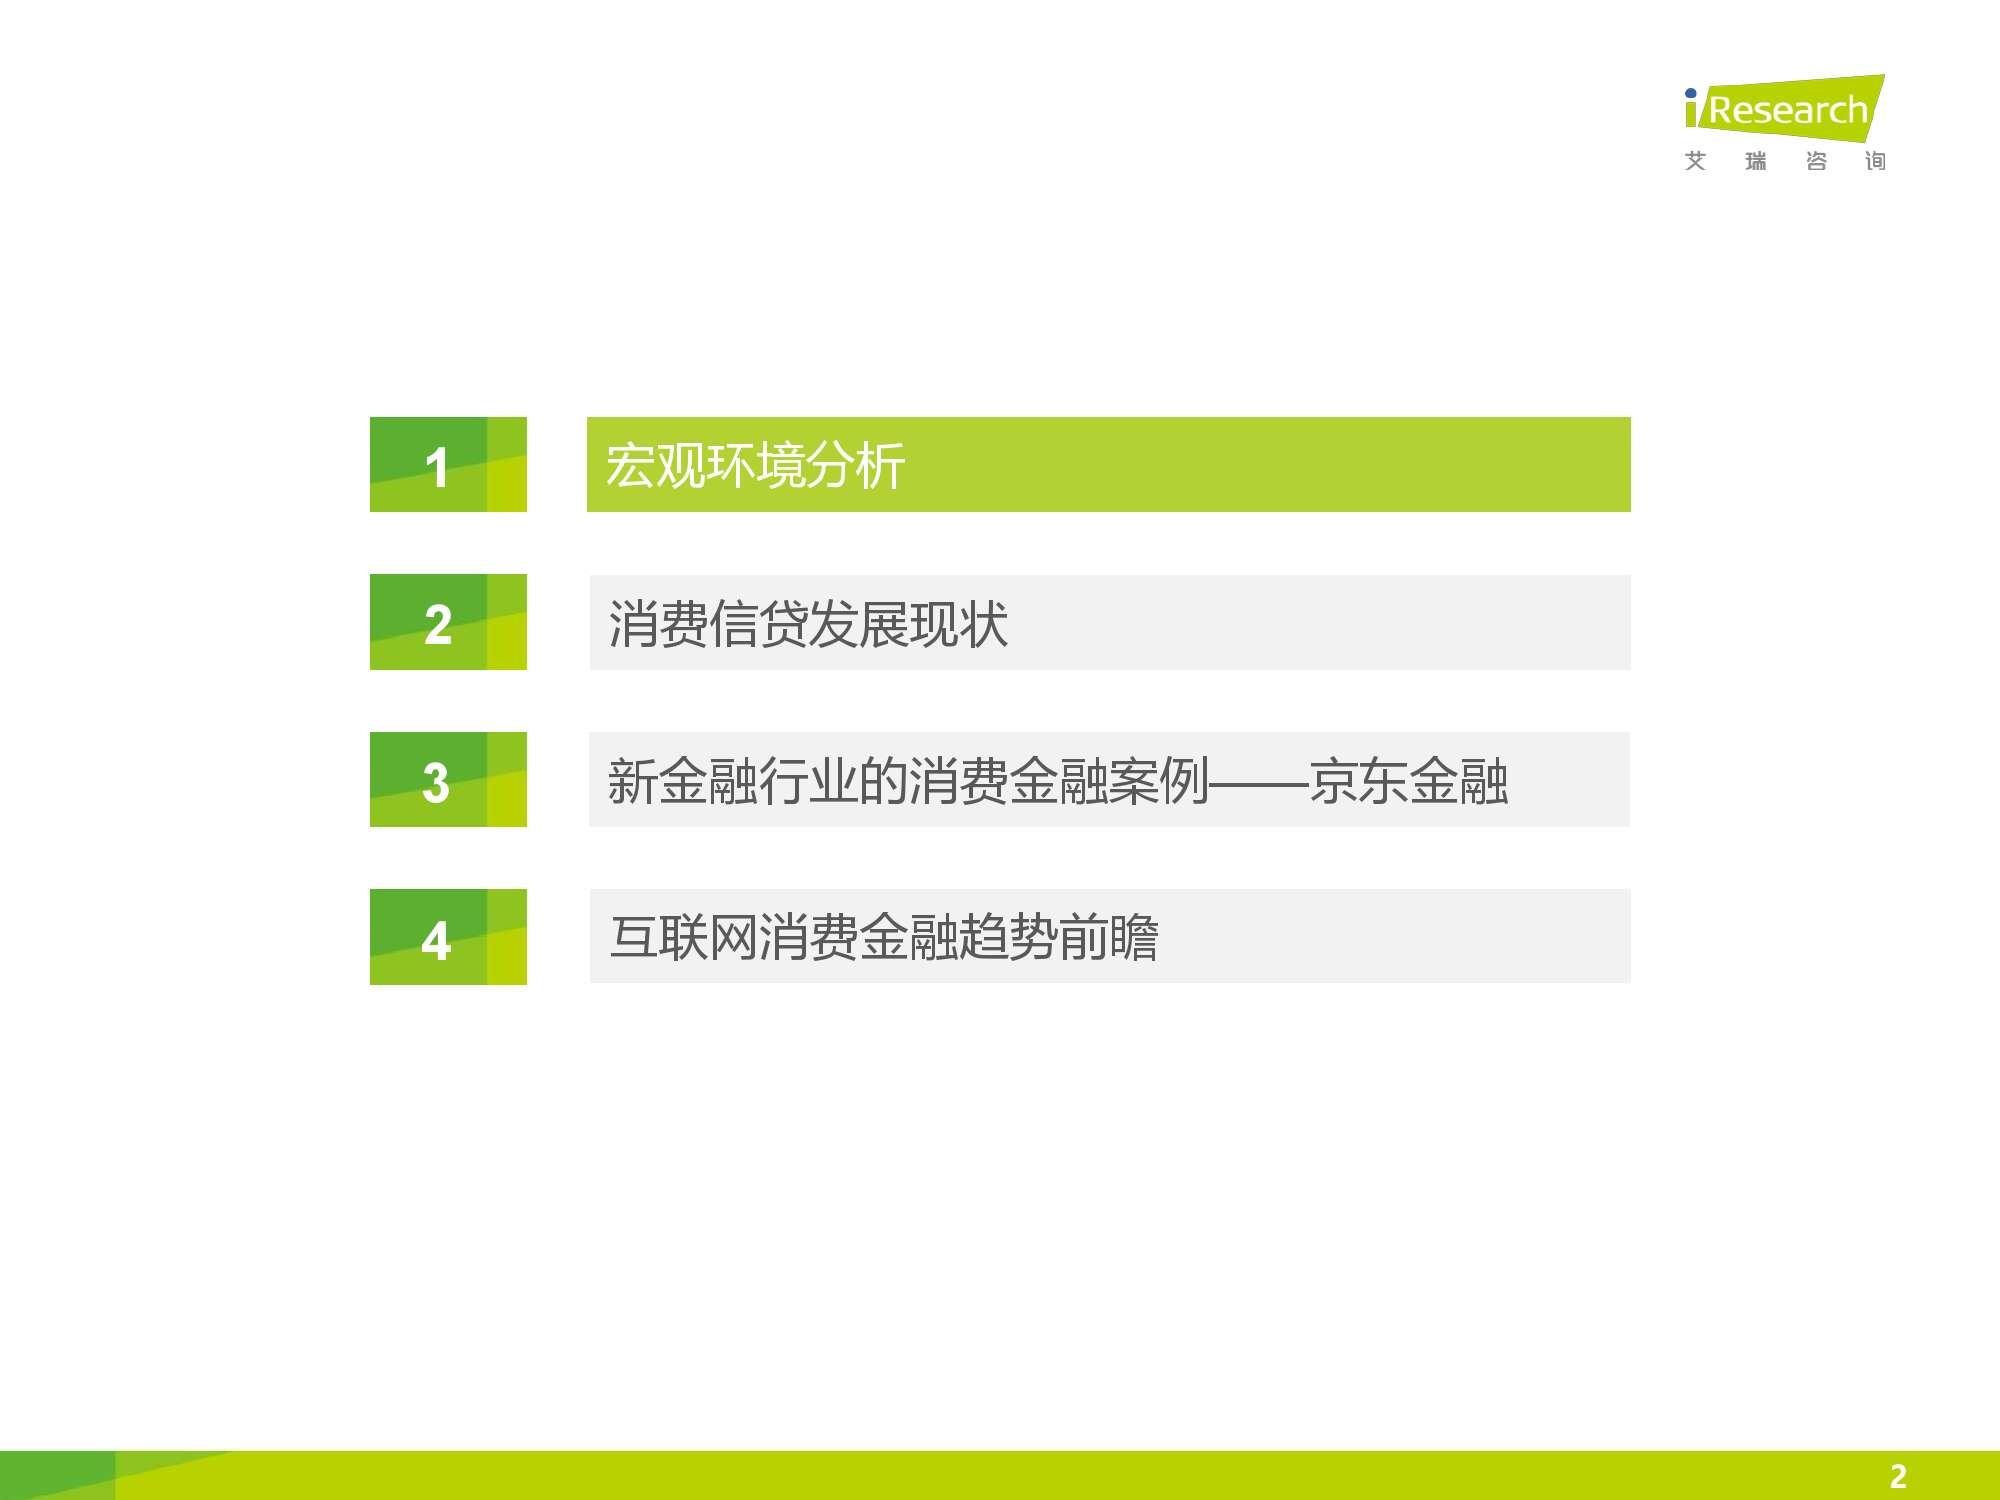 iResearch-2016年中国互联网消费金融市场研究报告_000002